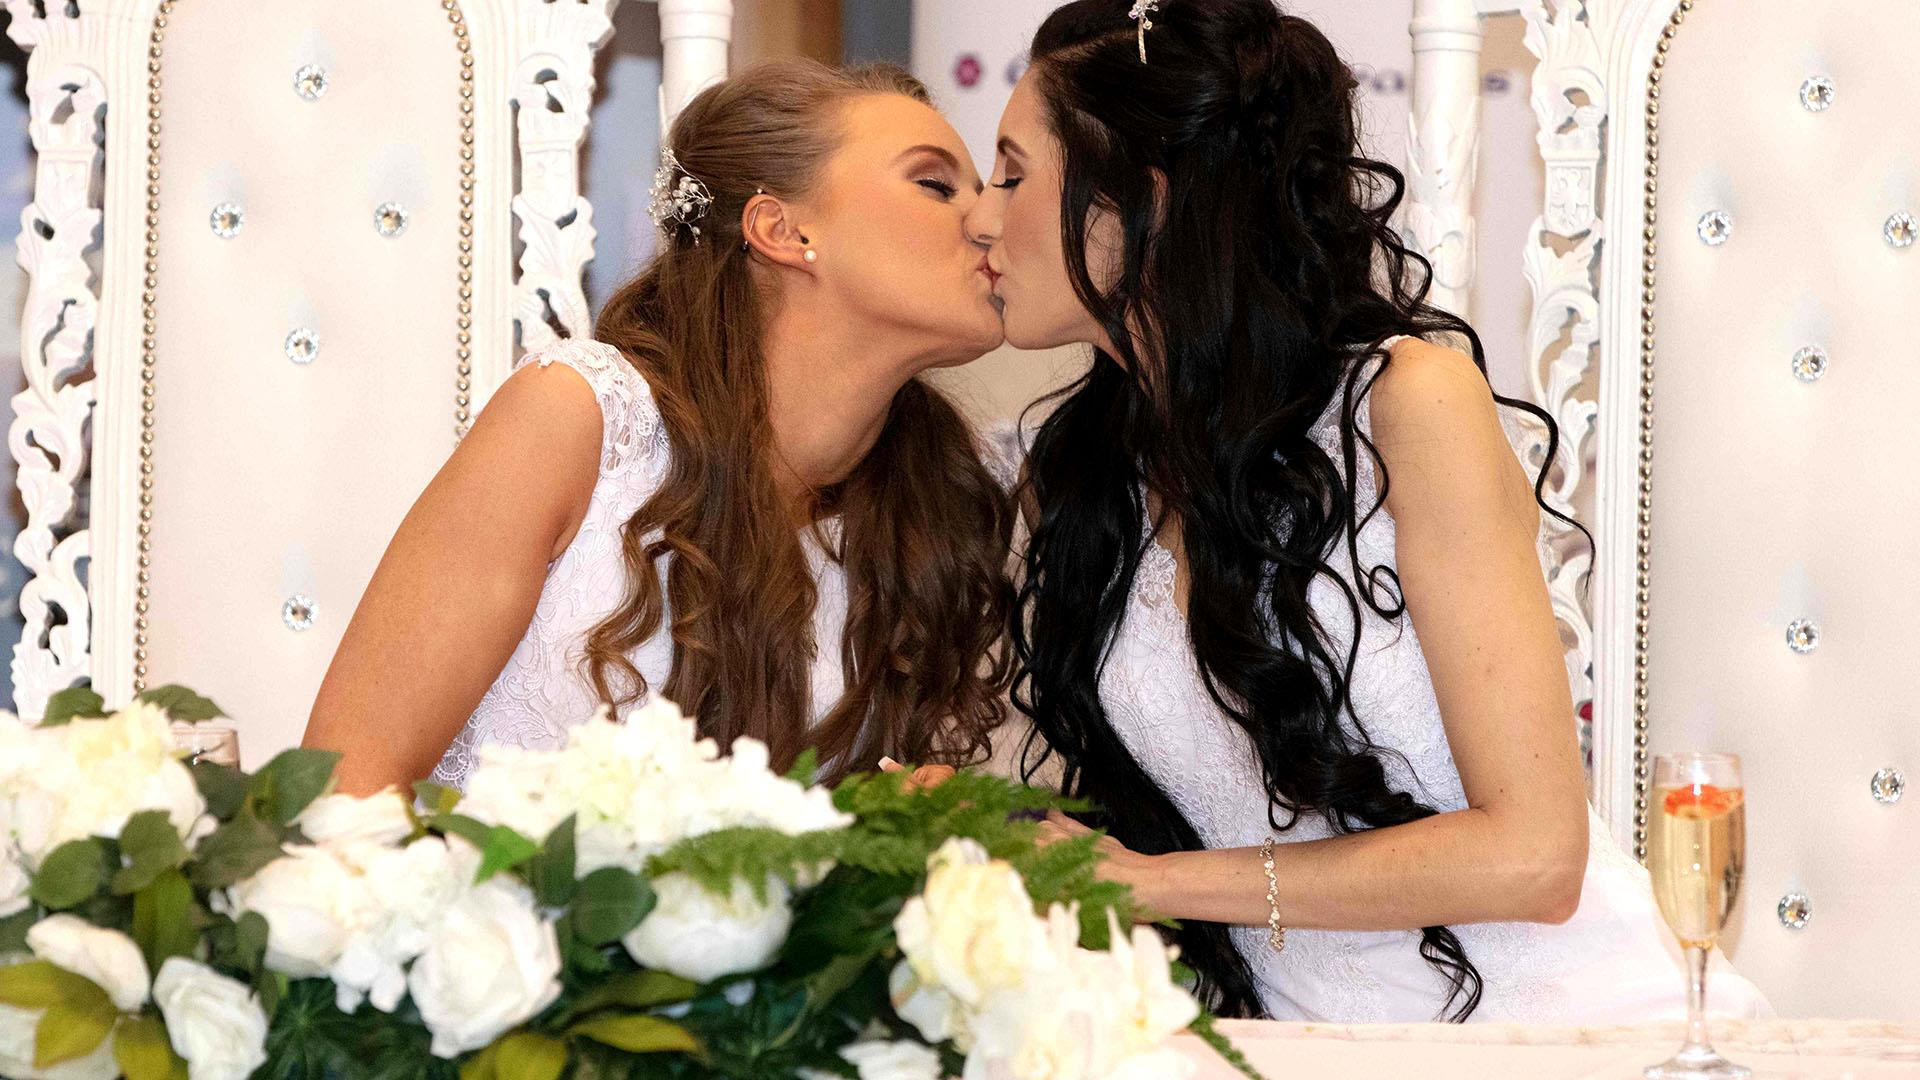 Ireland marriage same sex